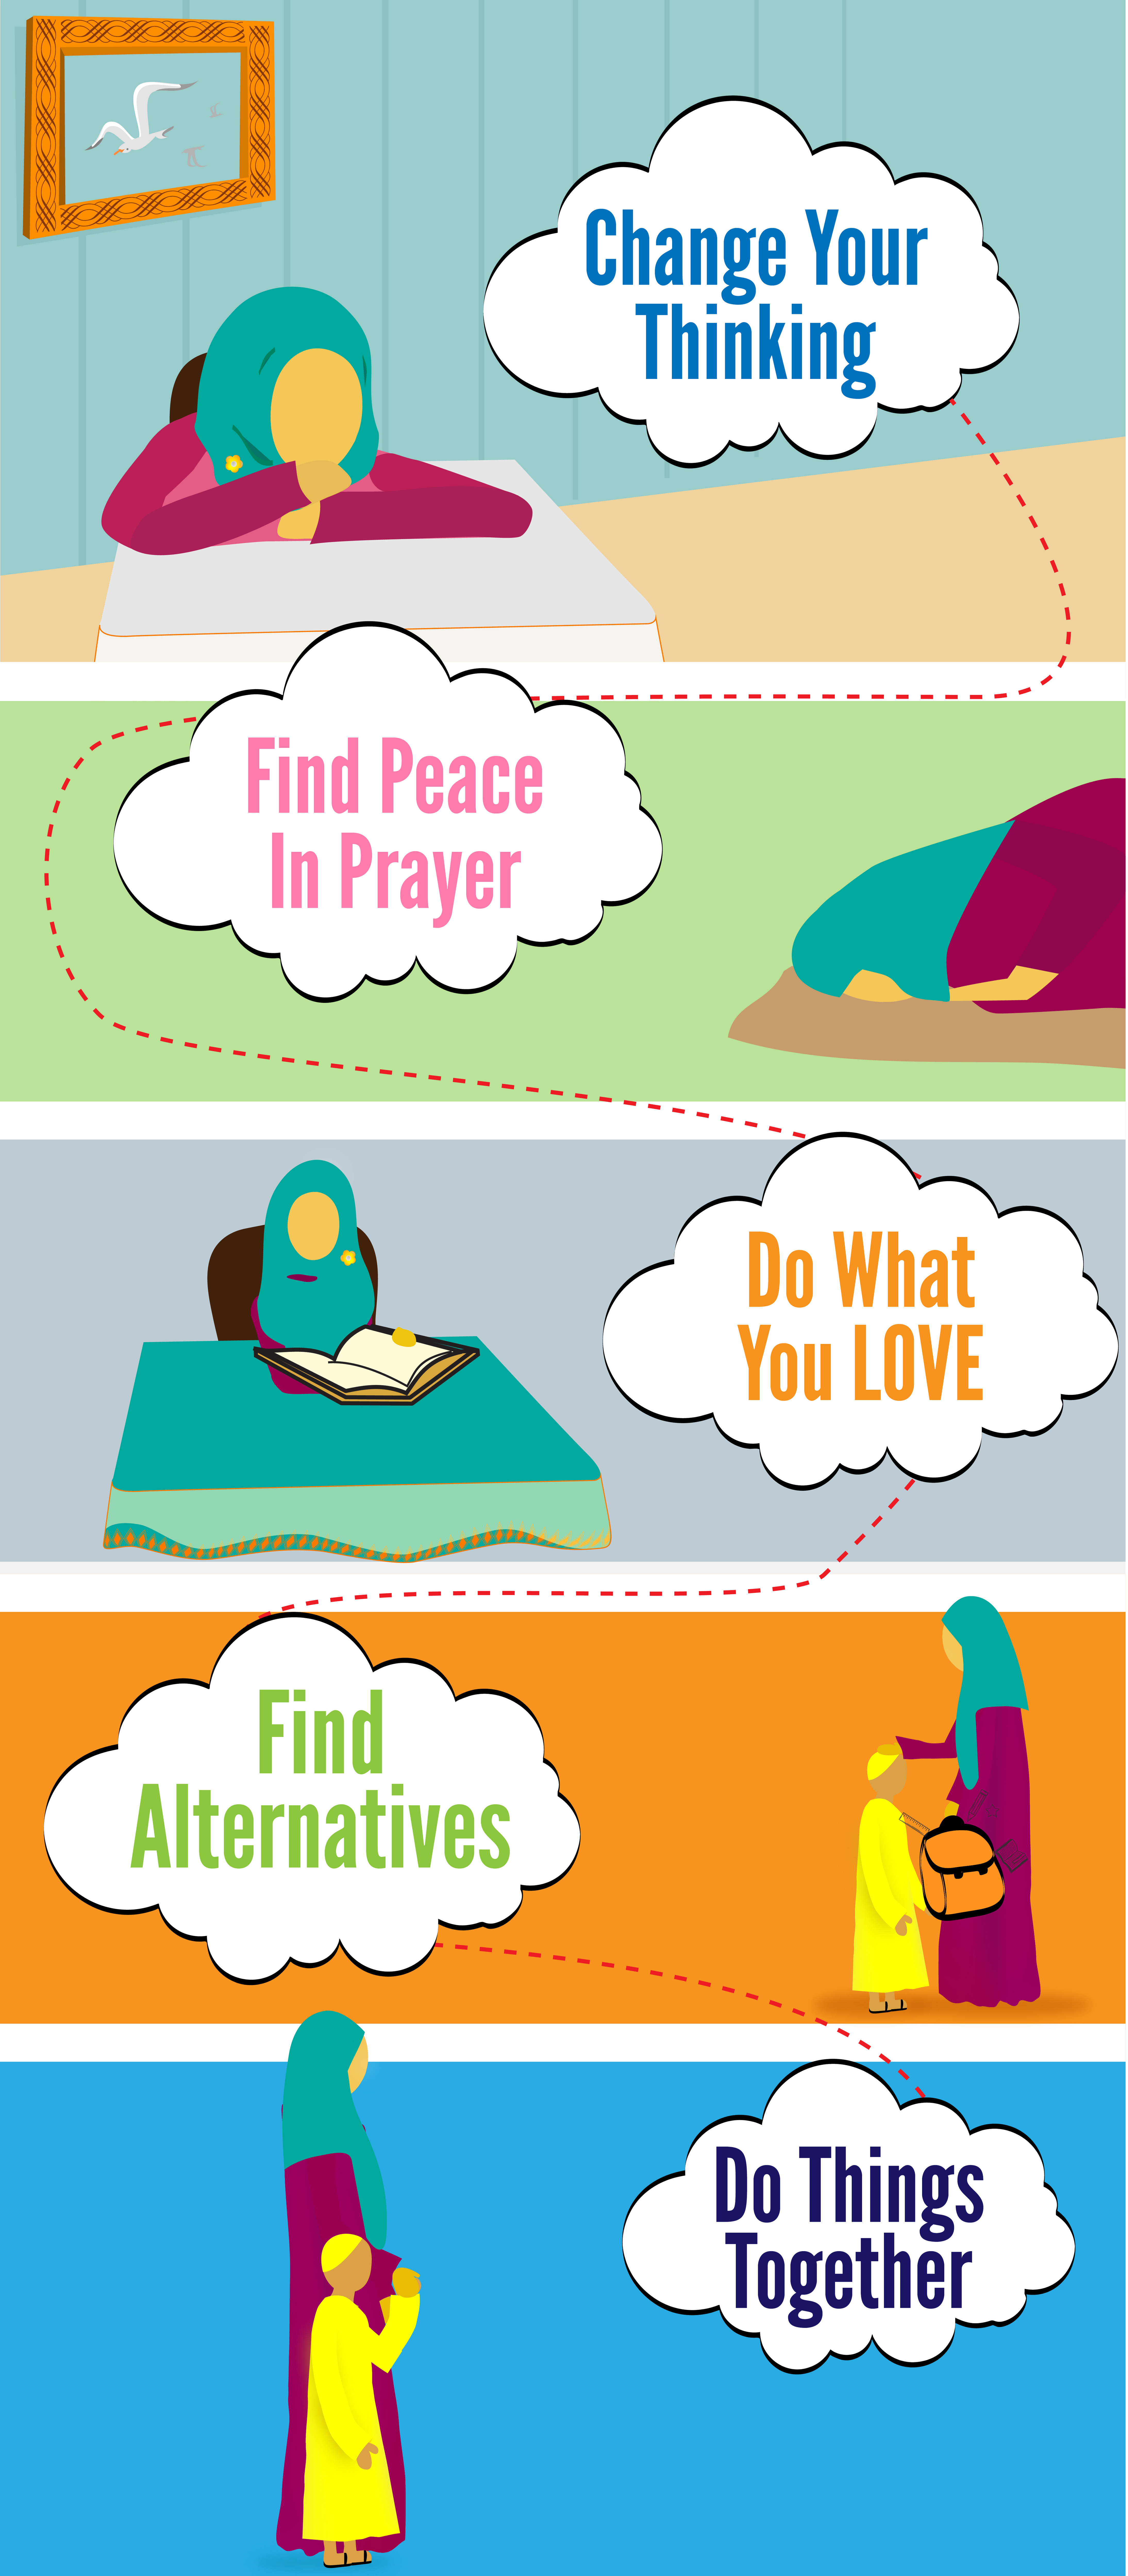 info_find peace